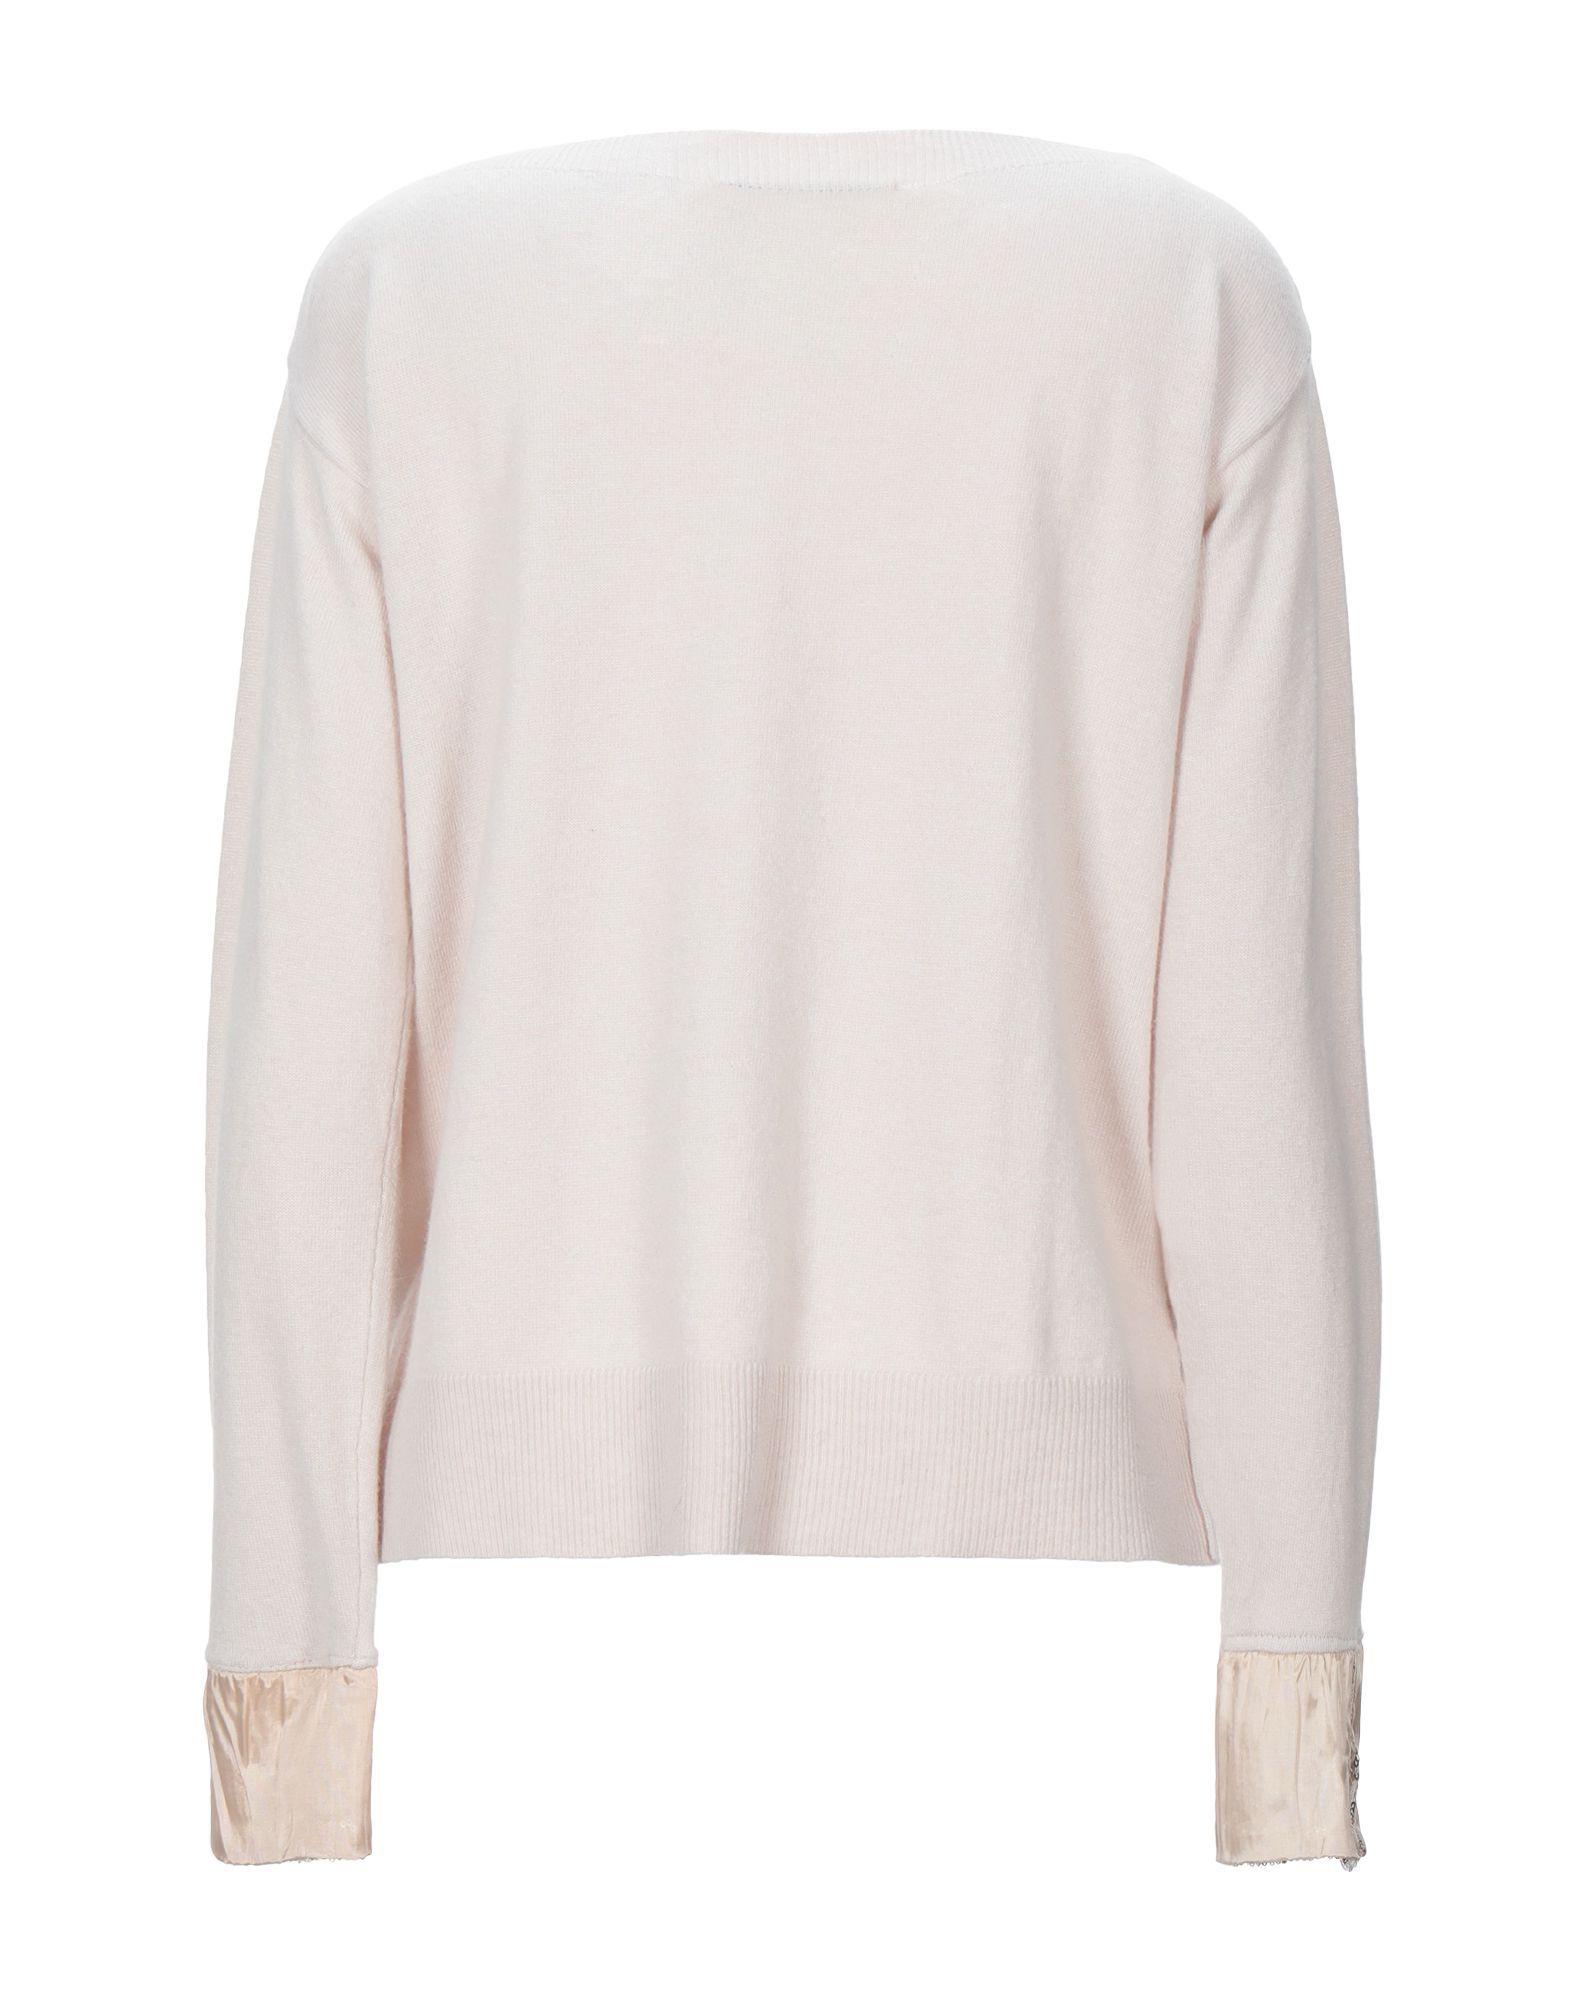 Kaos Ivory Knit Sequin Jumper